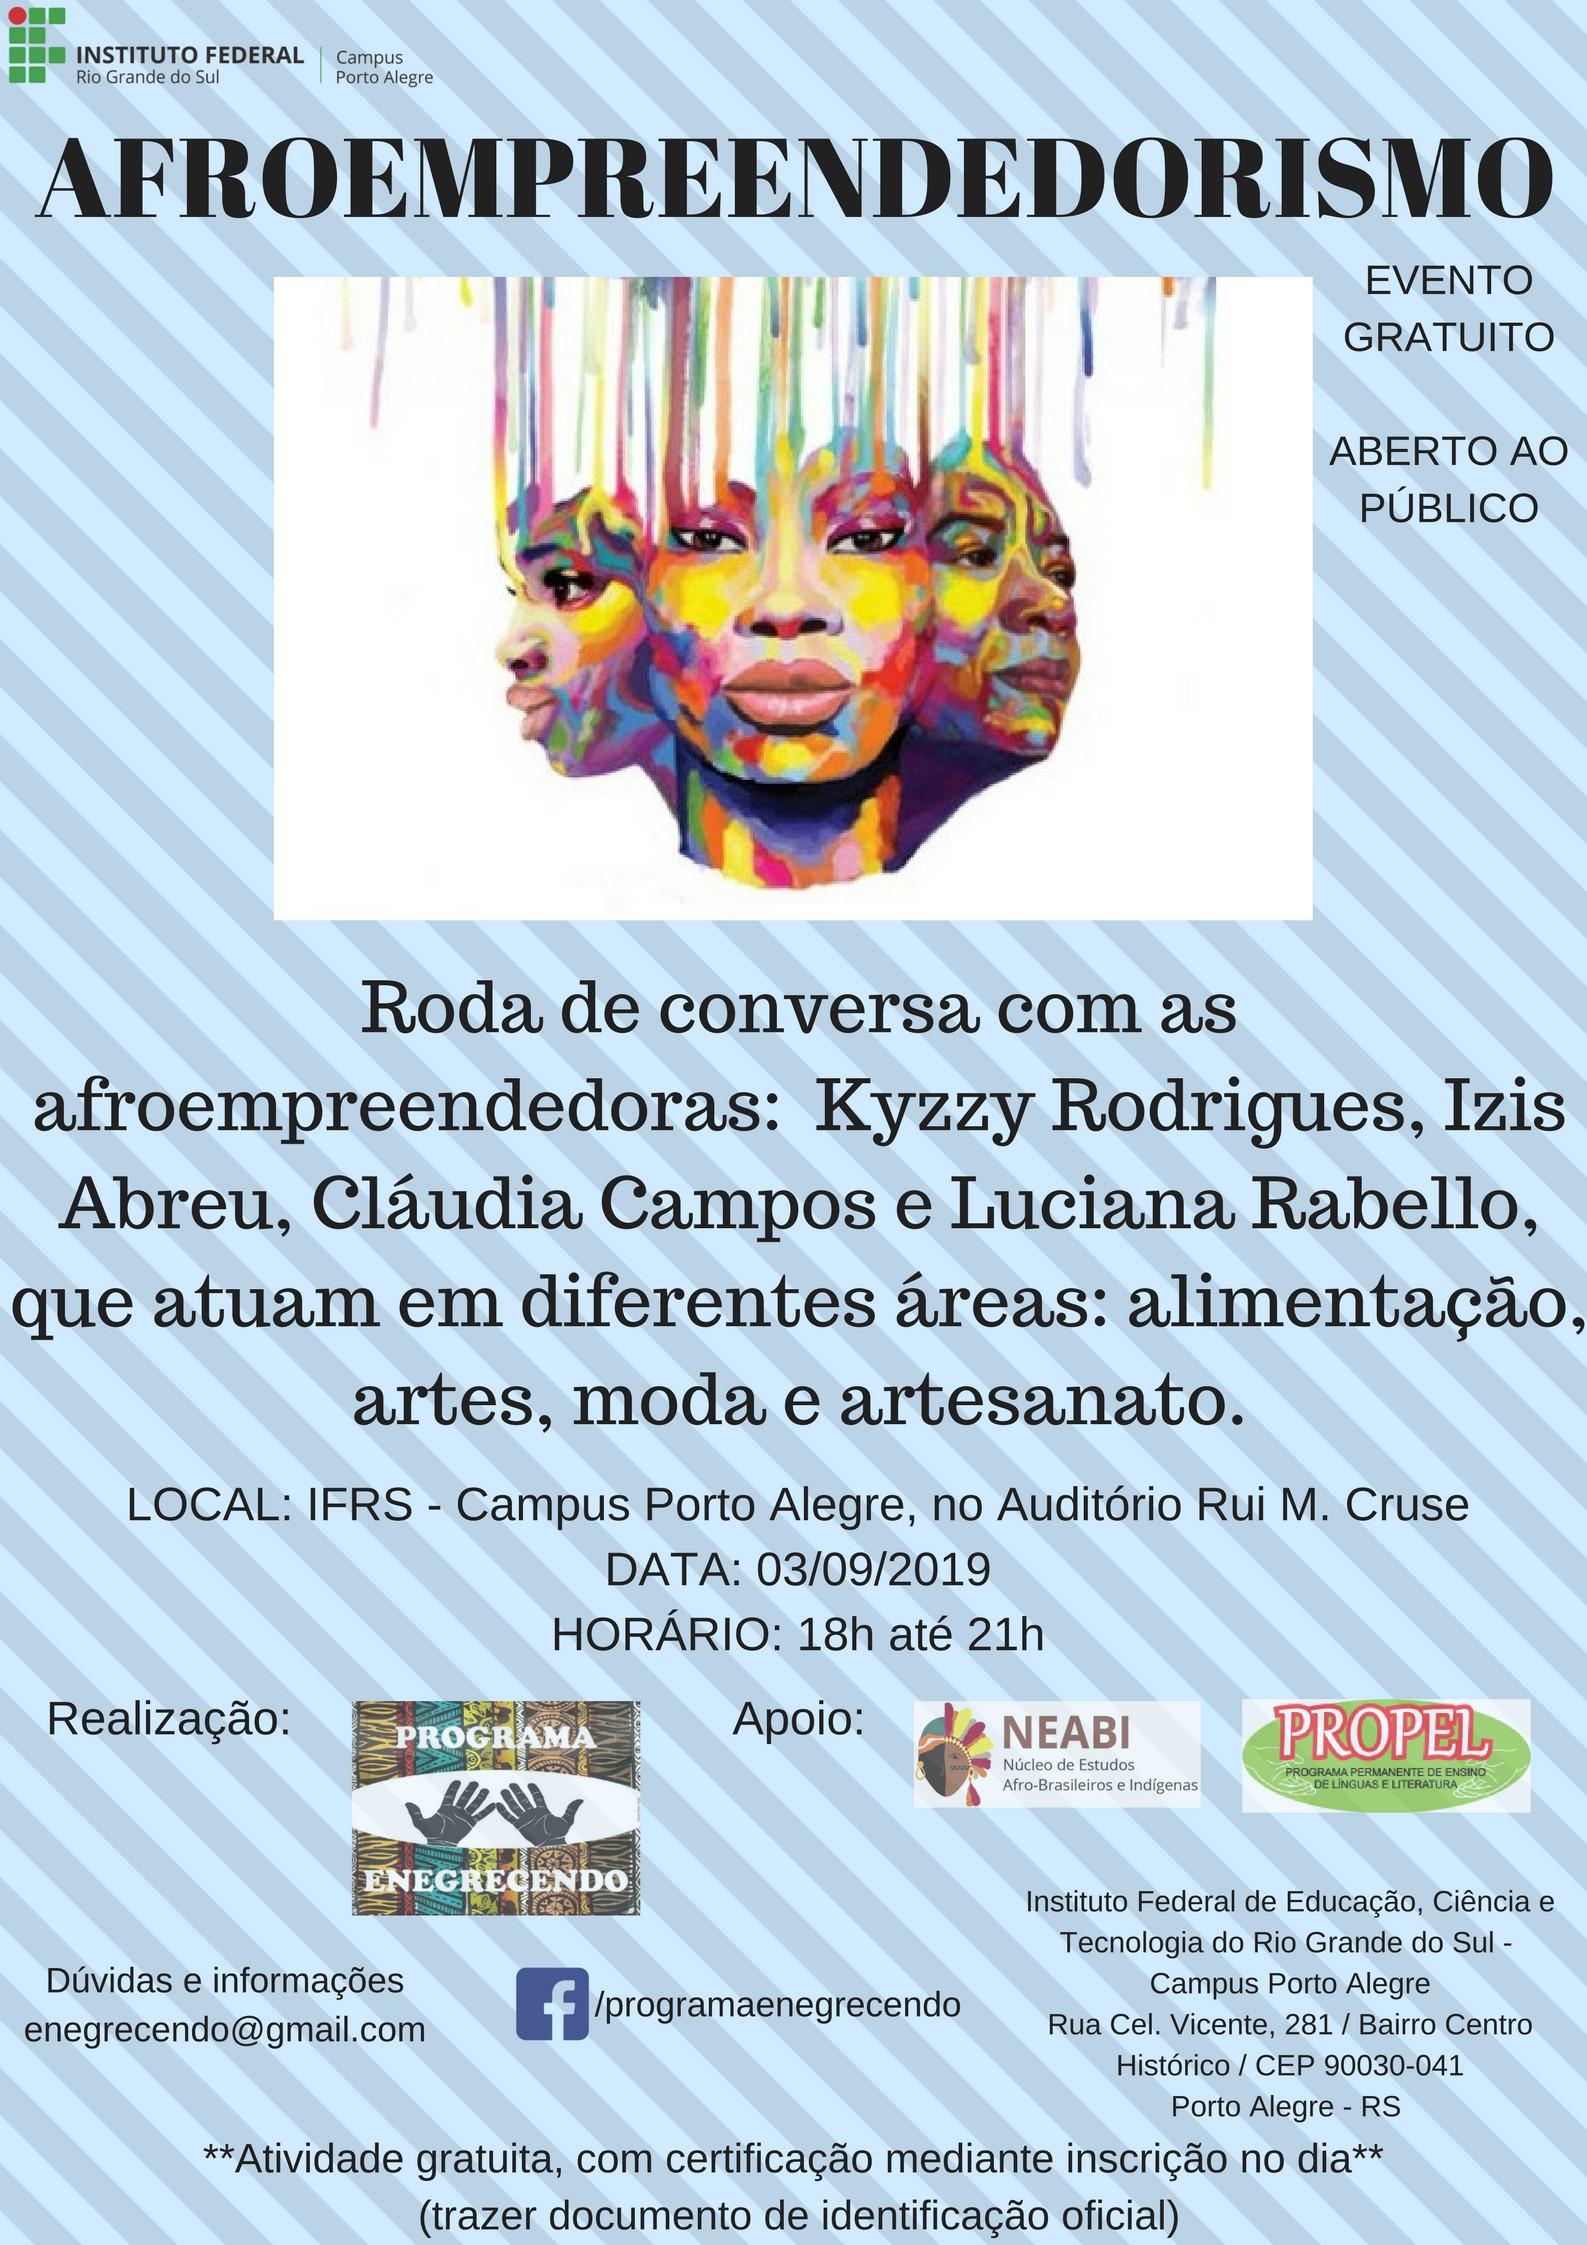 Evento sobre Afroempreendedorismo acontece dia 03 9 no Campus Porto Alegre